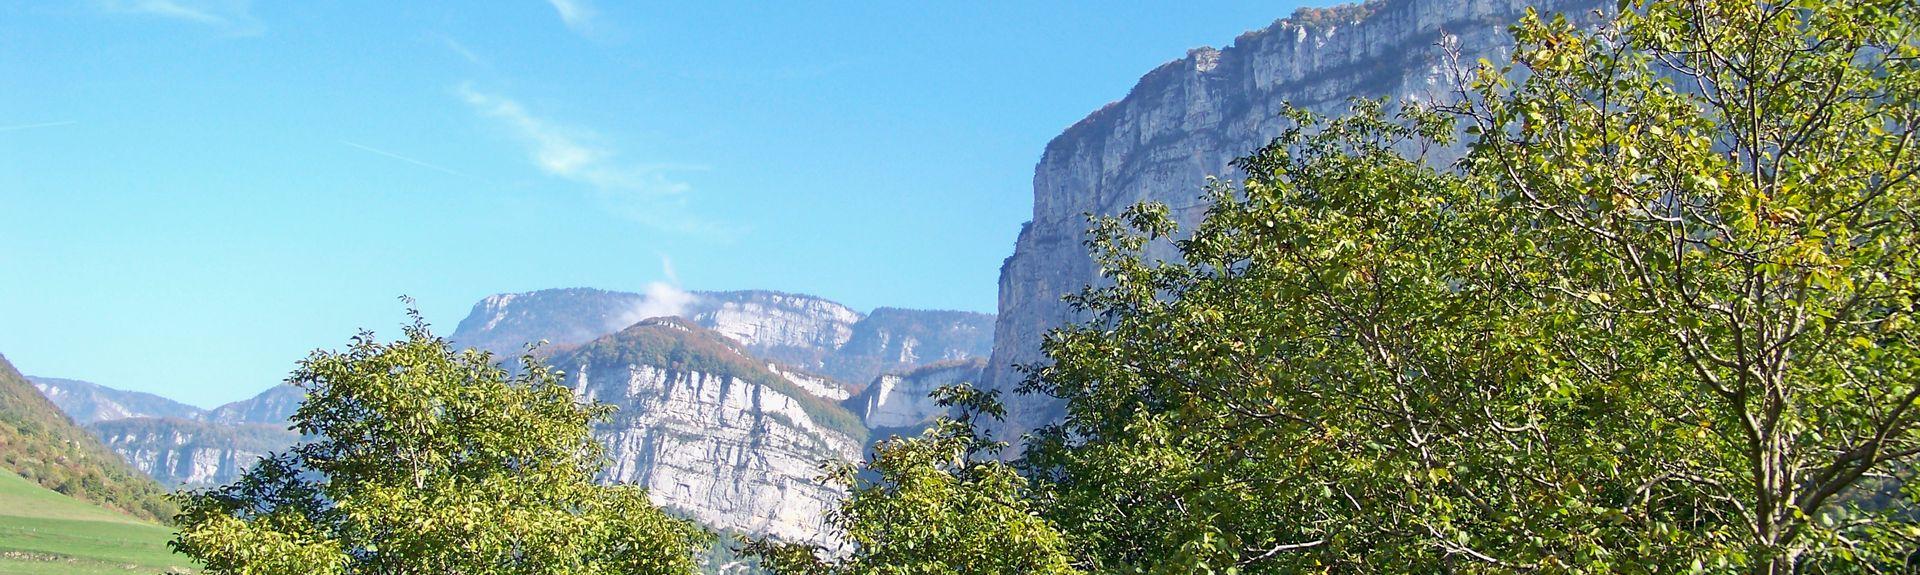 Rencurel, Auvernia-Ródano-Alpes, Francia